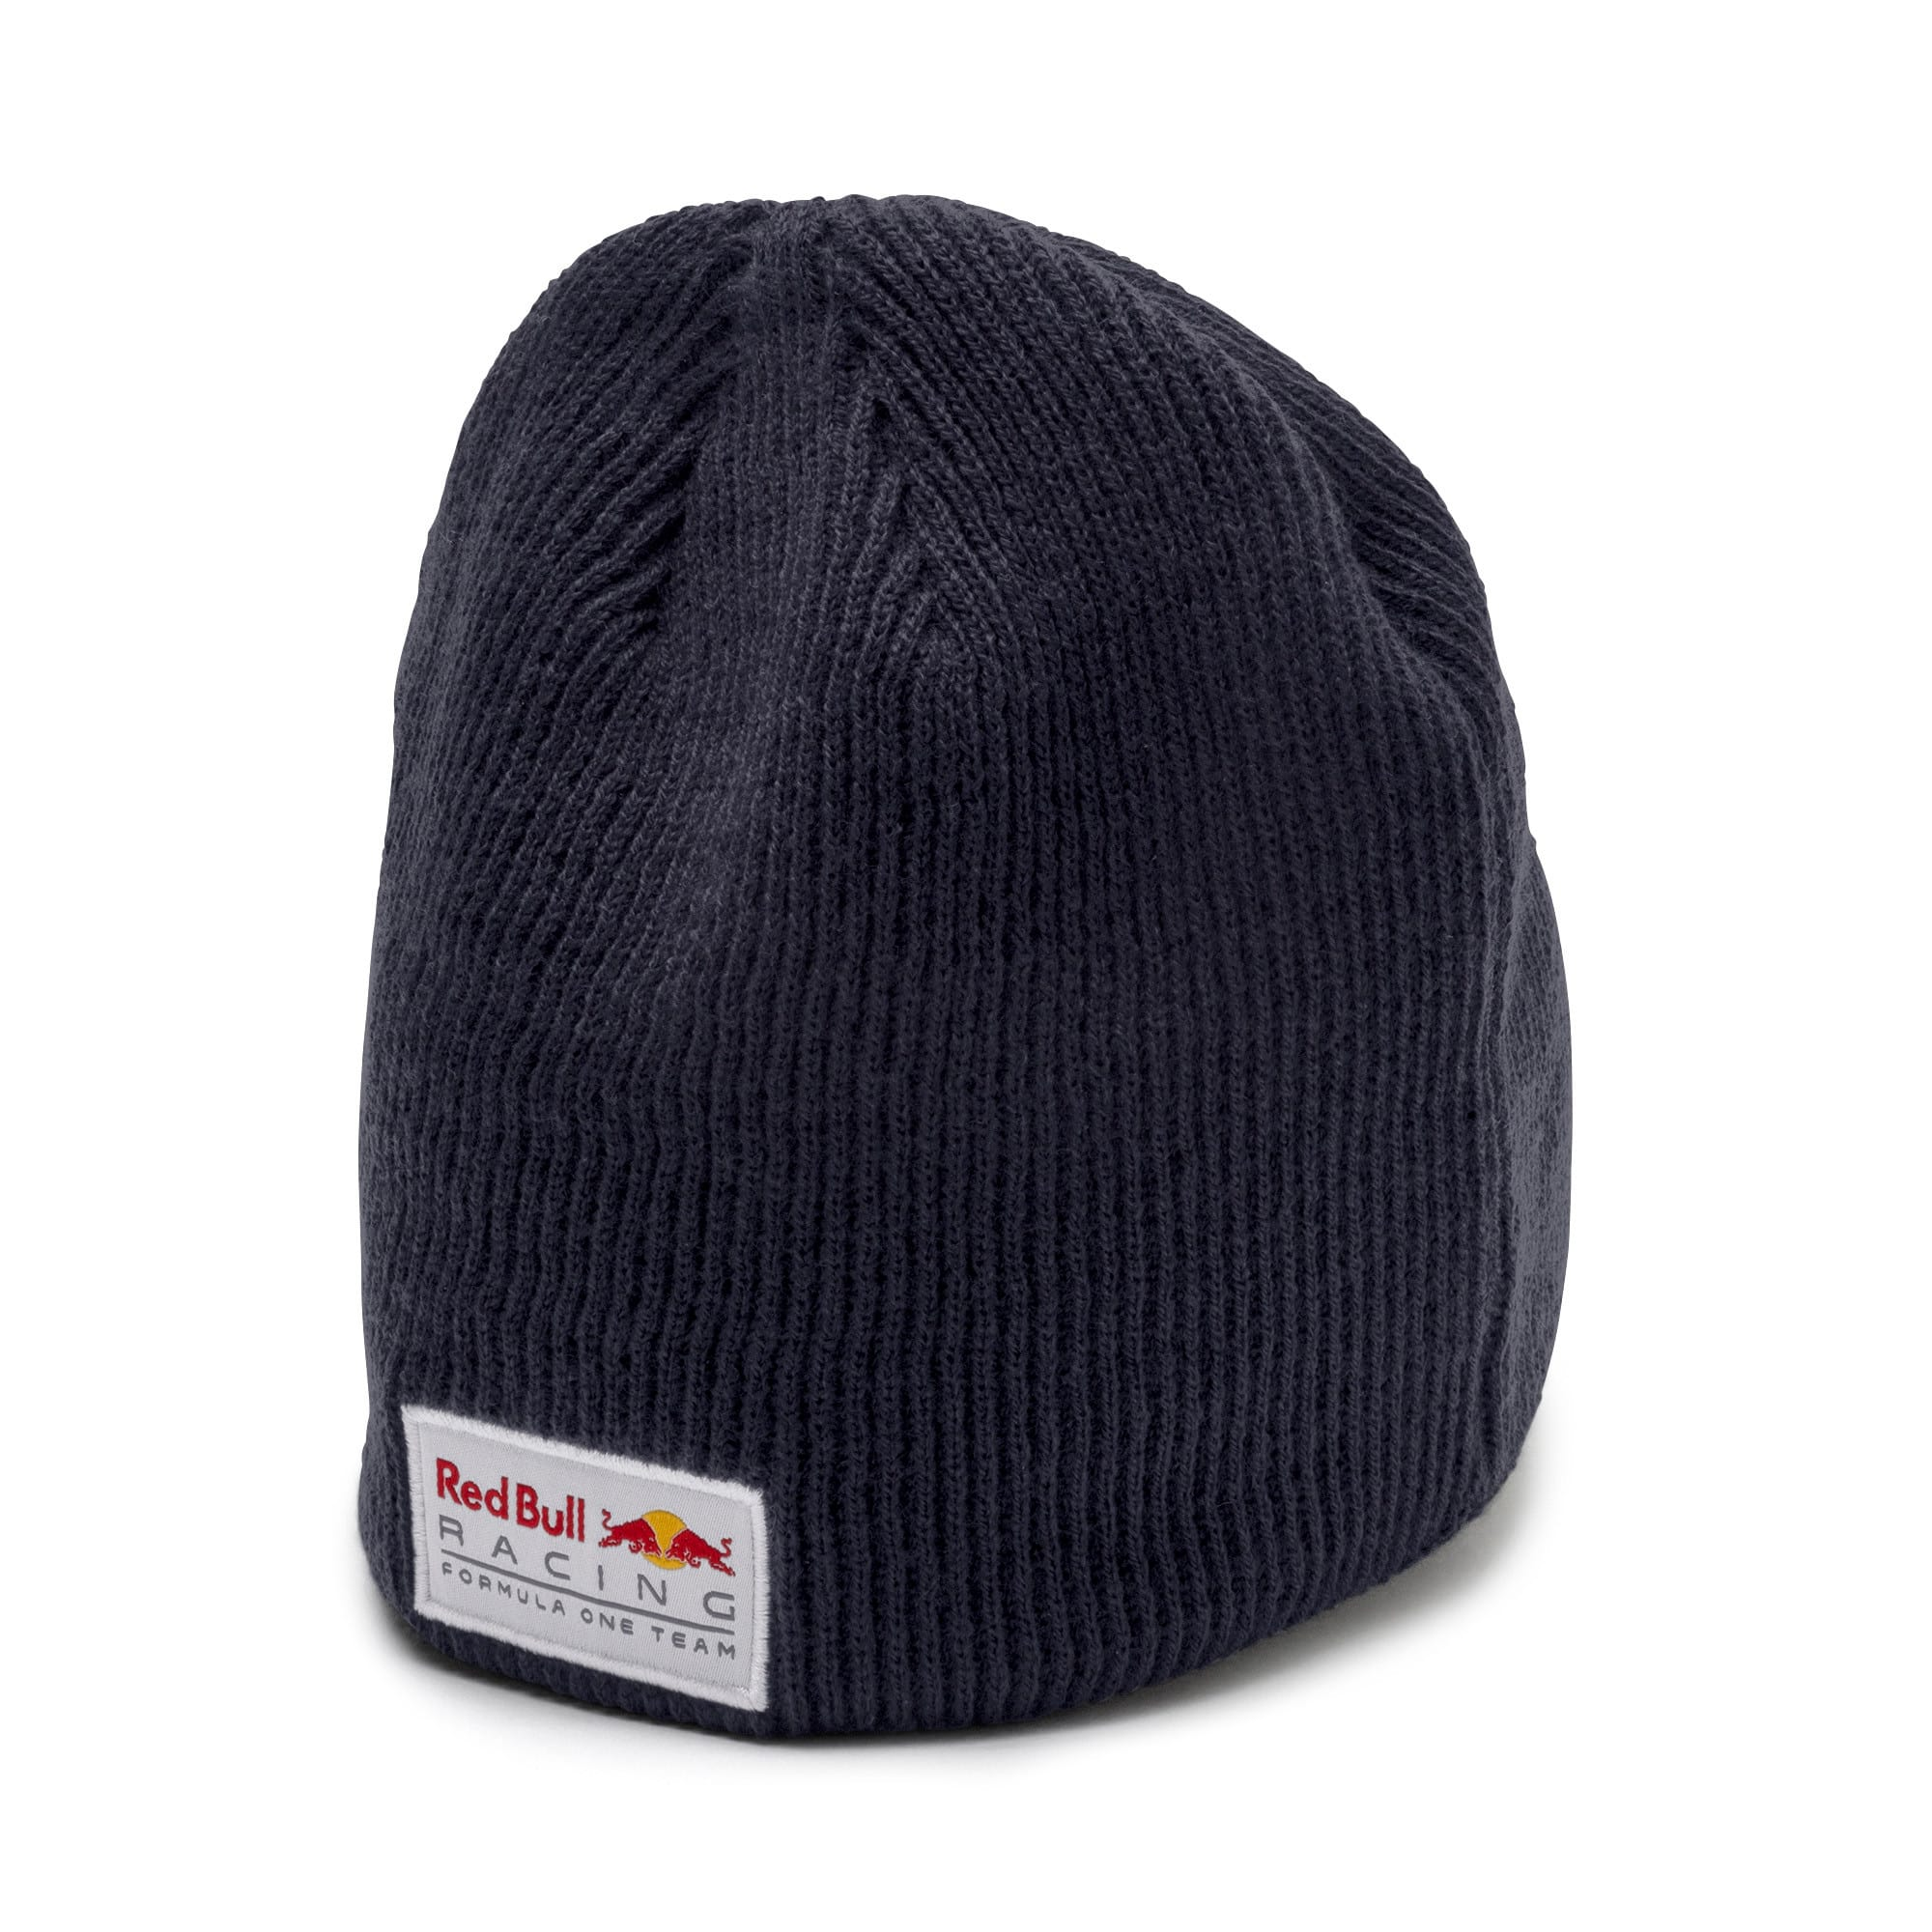 Thumbnail 2 of Red Bull Racing Lifestyle Beanie, NIGHT SKY, medium